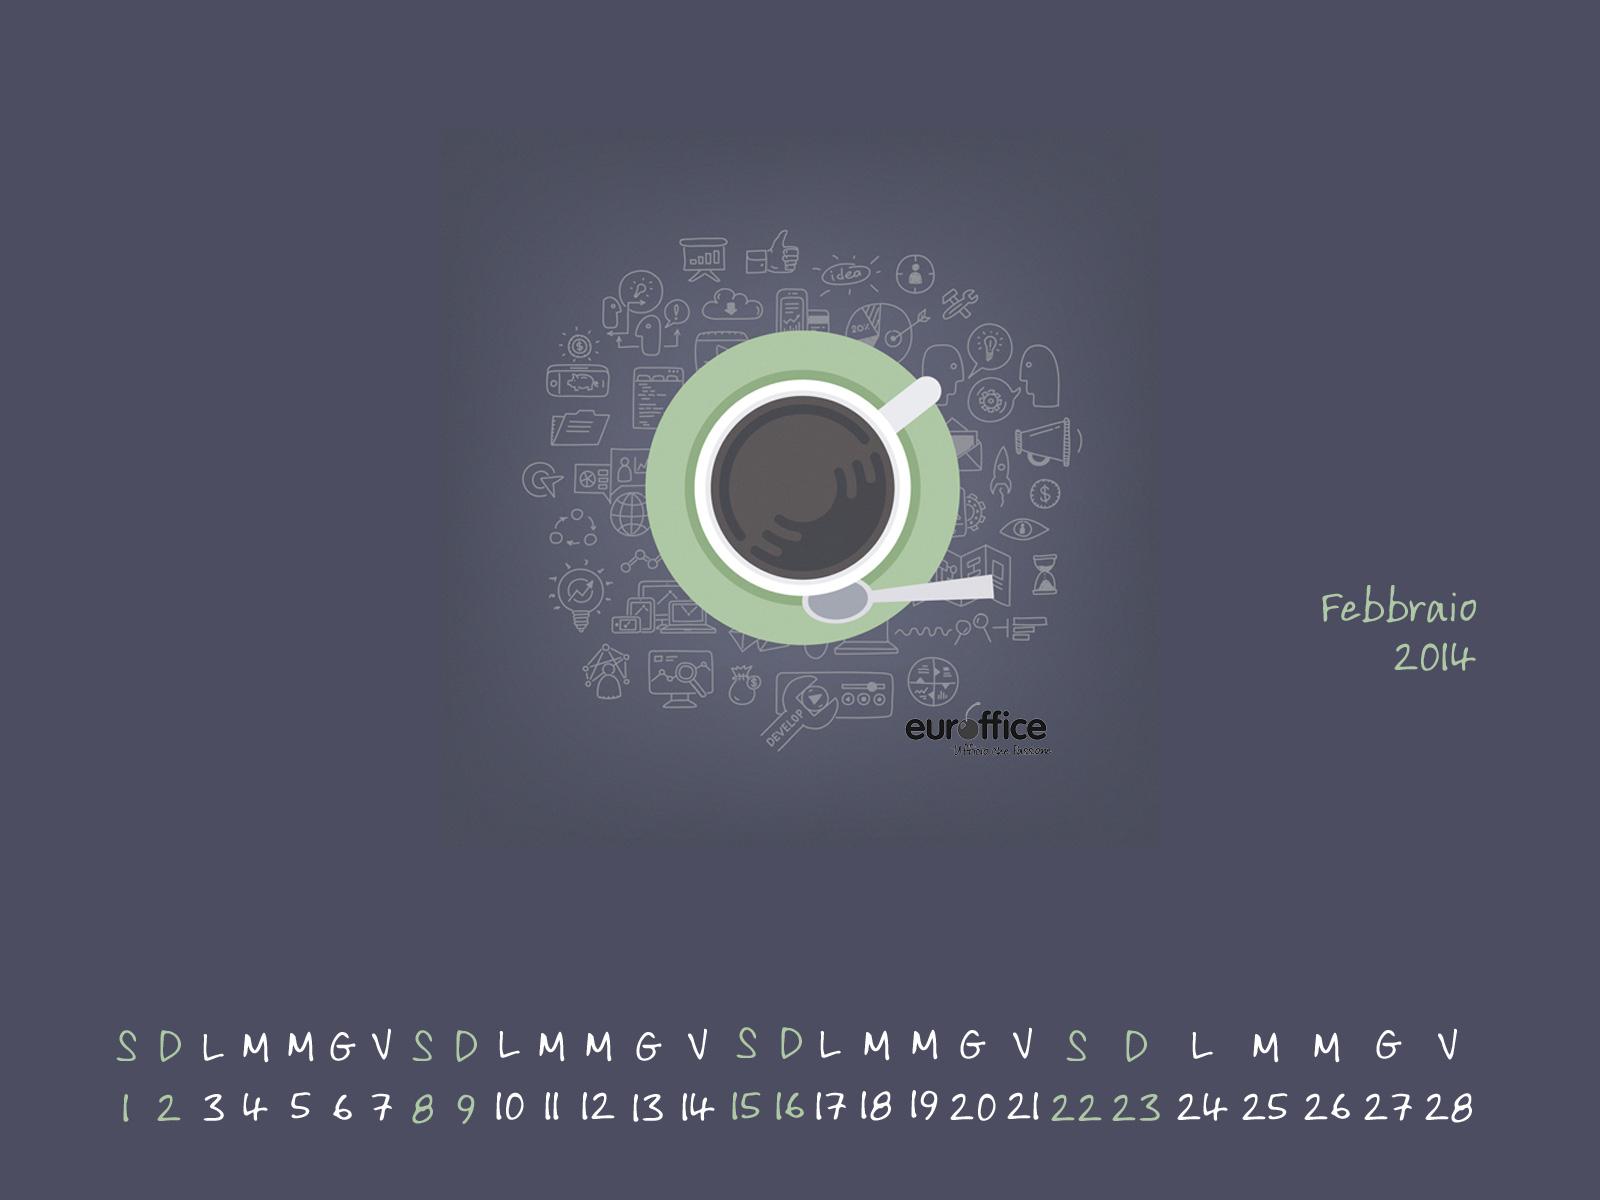 Wallpaper febbraio 2014 - Coffee